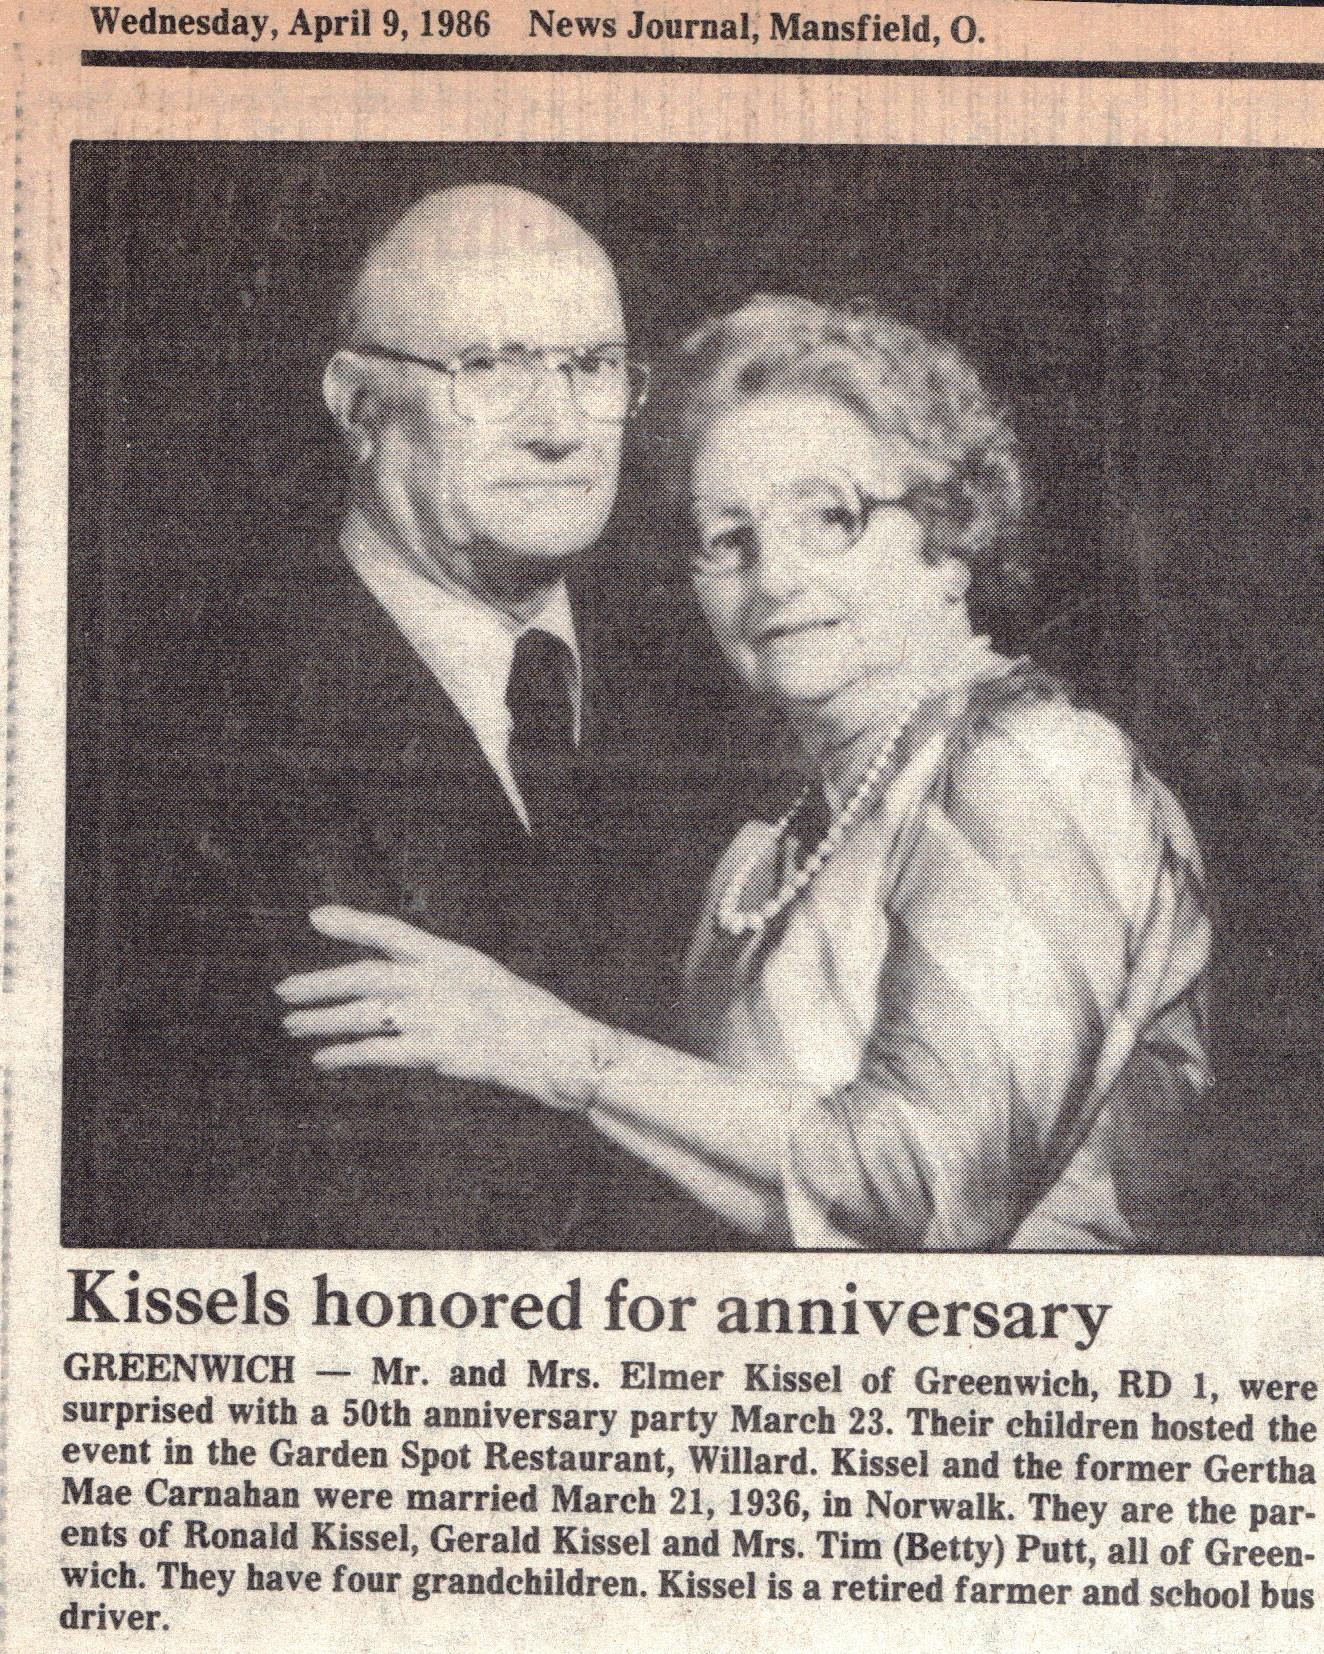 Elmer Keisel